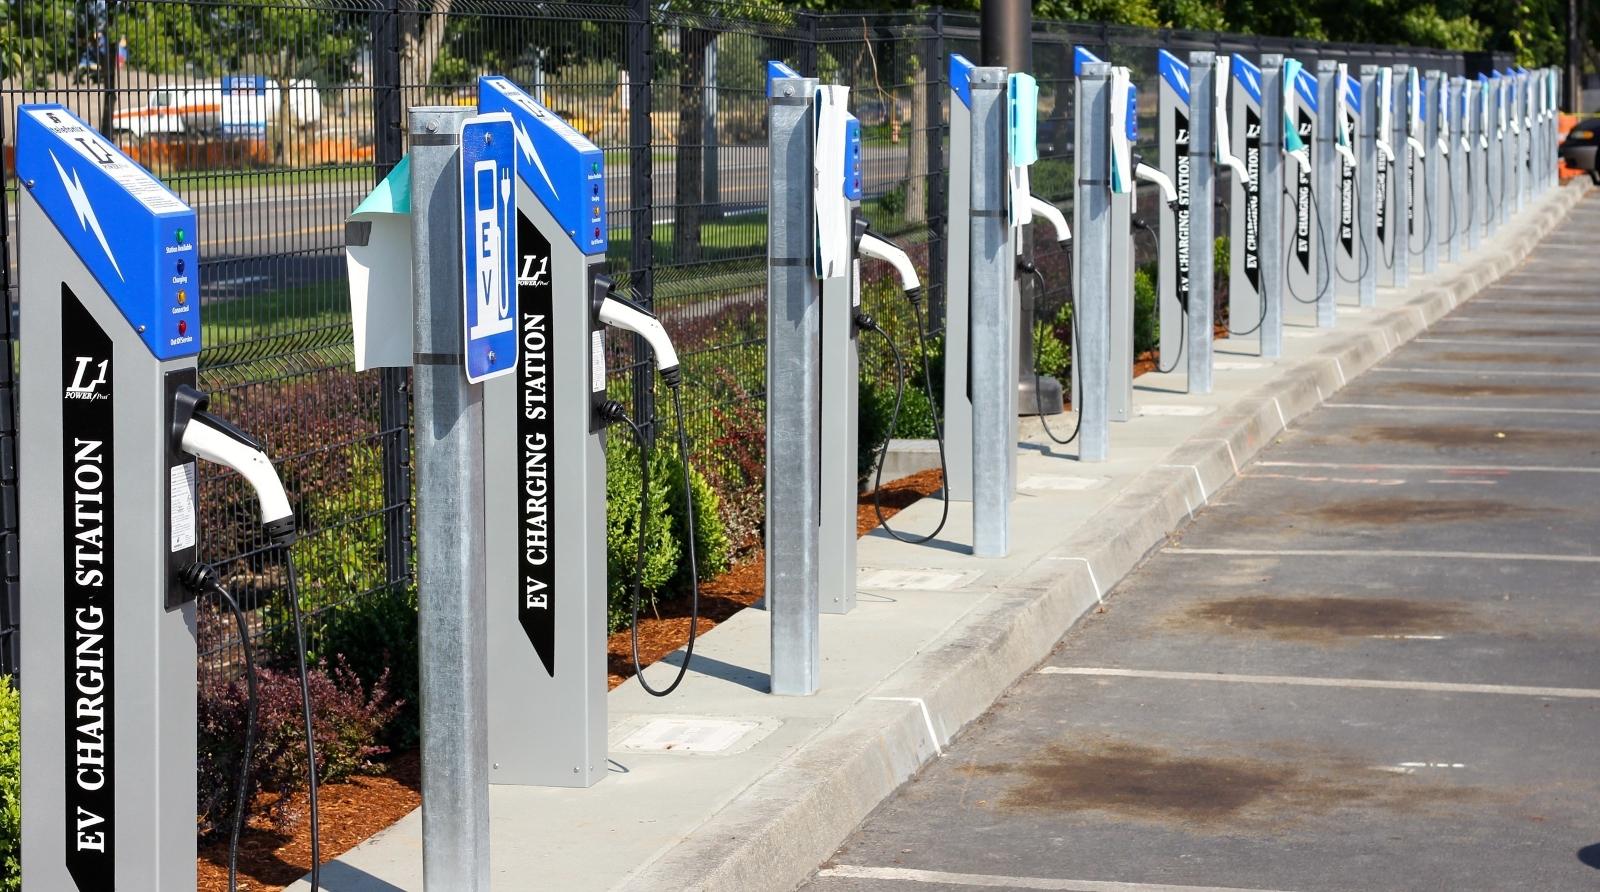 Croatia to set upmore EV charging stations in 2018